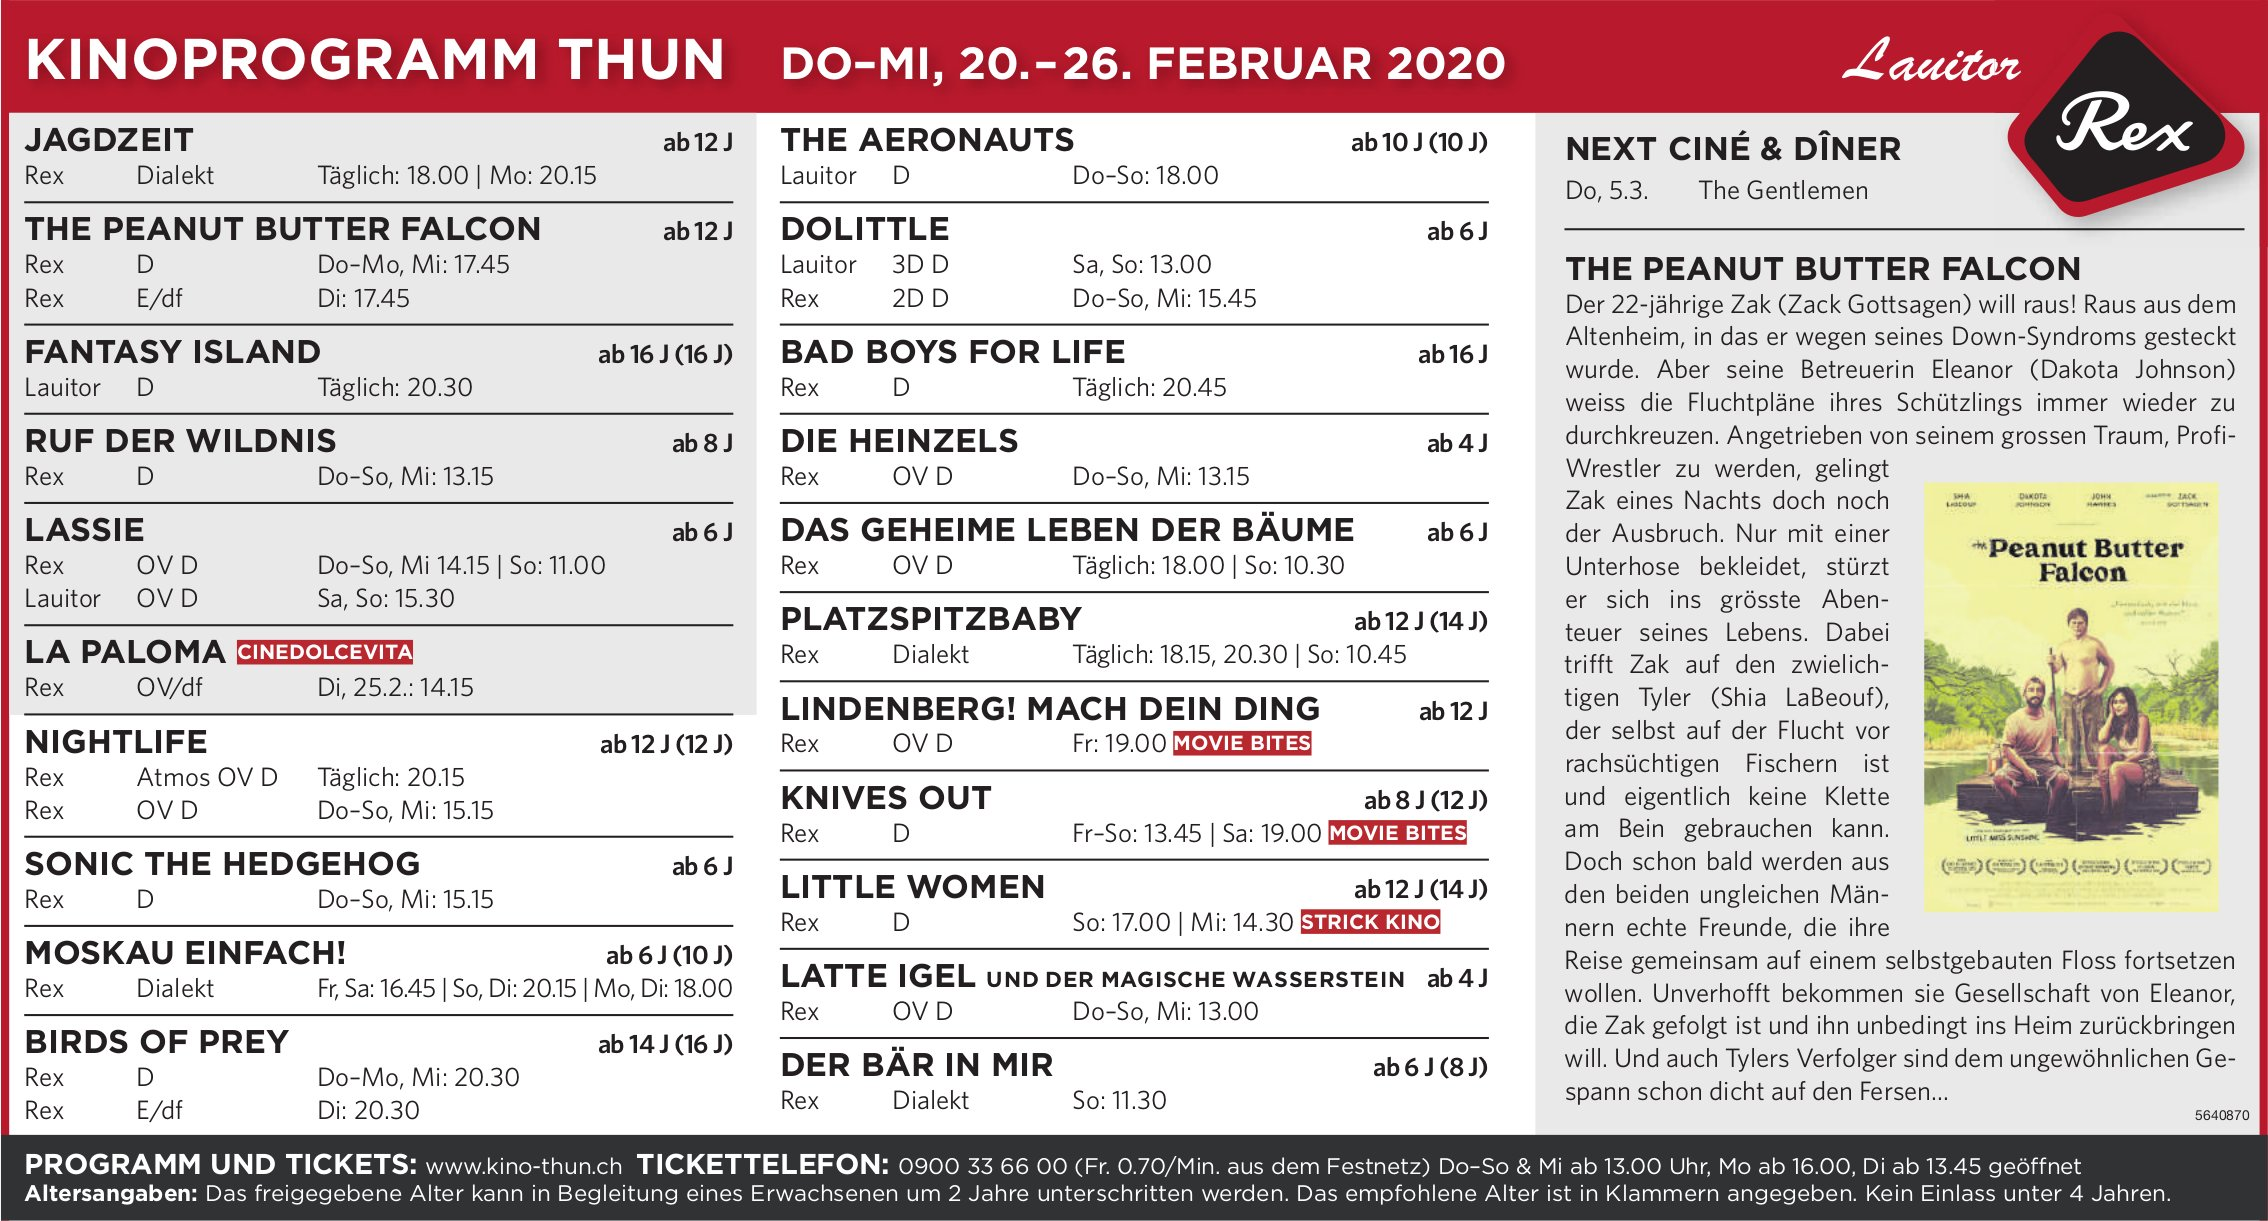 KINOPROGRAMM THUN, DO-MI, 20.-26. FEBRUAR 2020